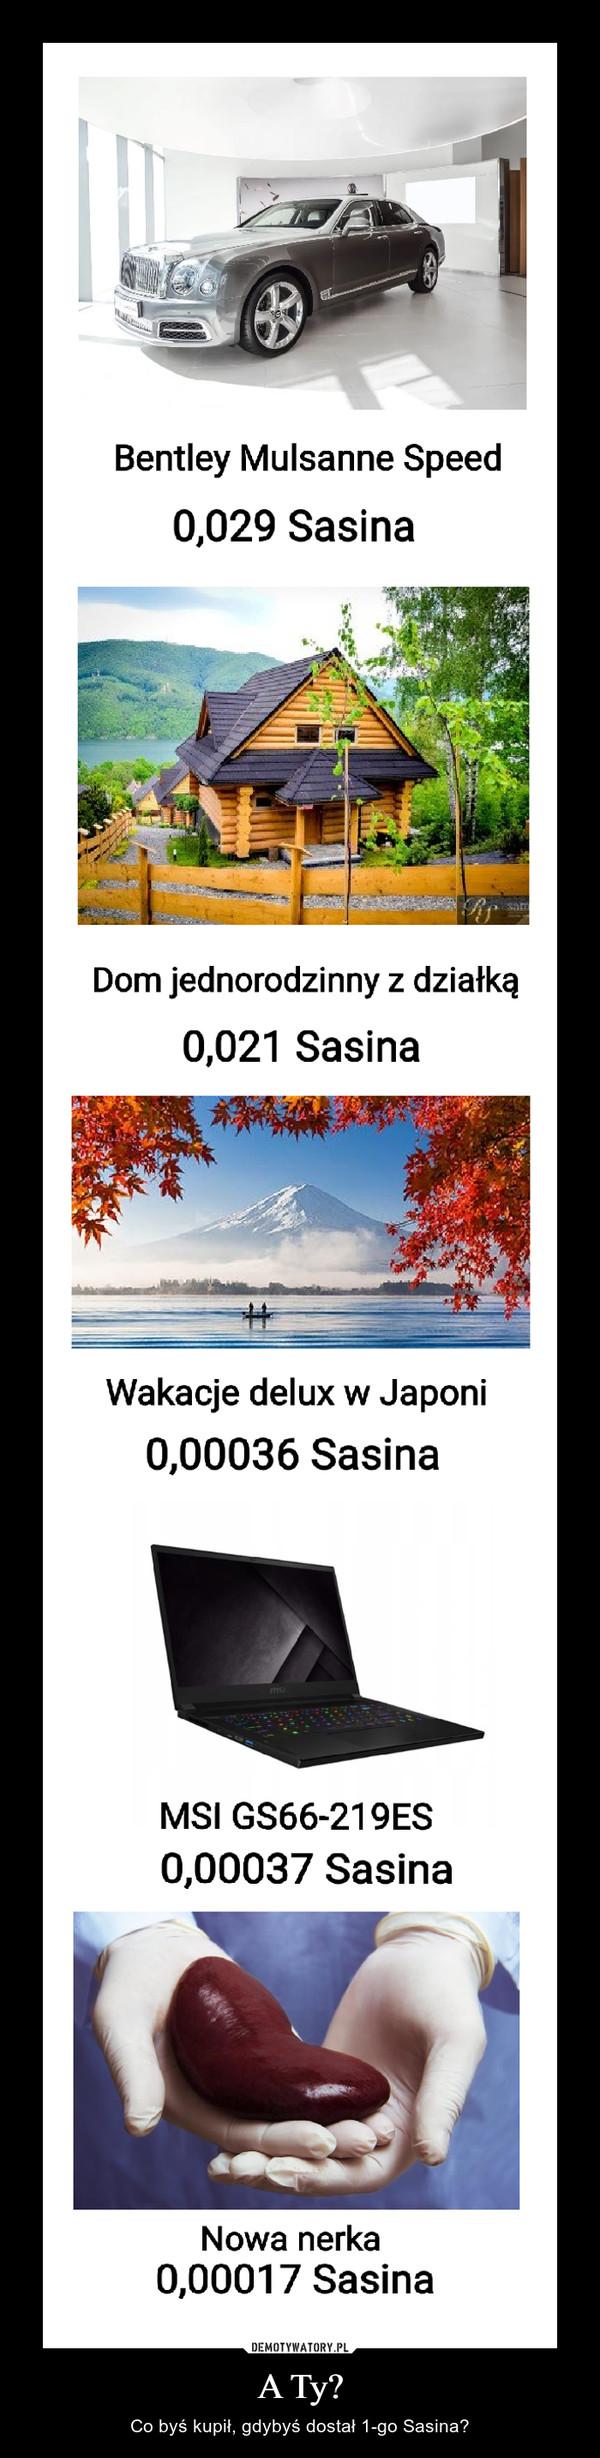 A Ty? – Co byś kupił, gdybyś dostał 1-go Sasina?